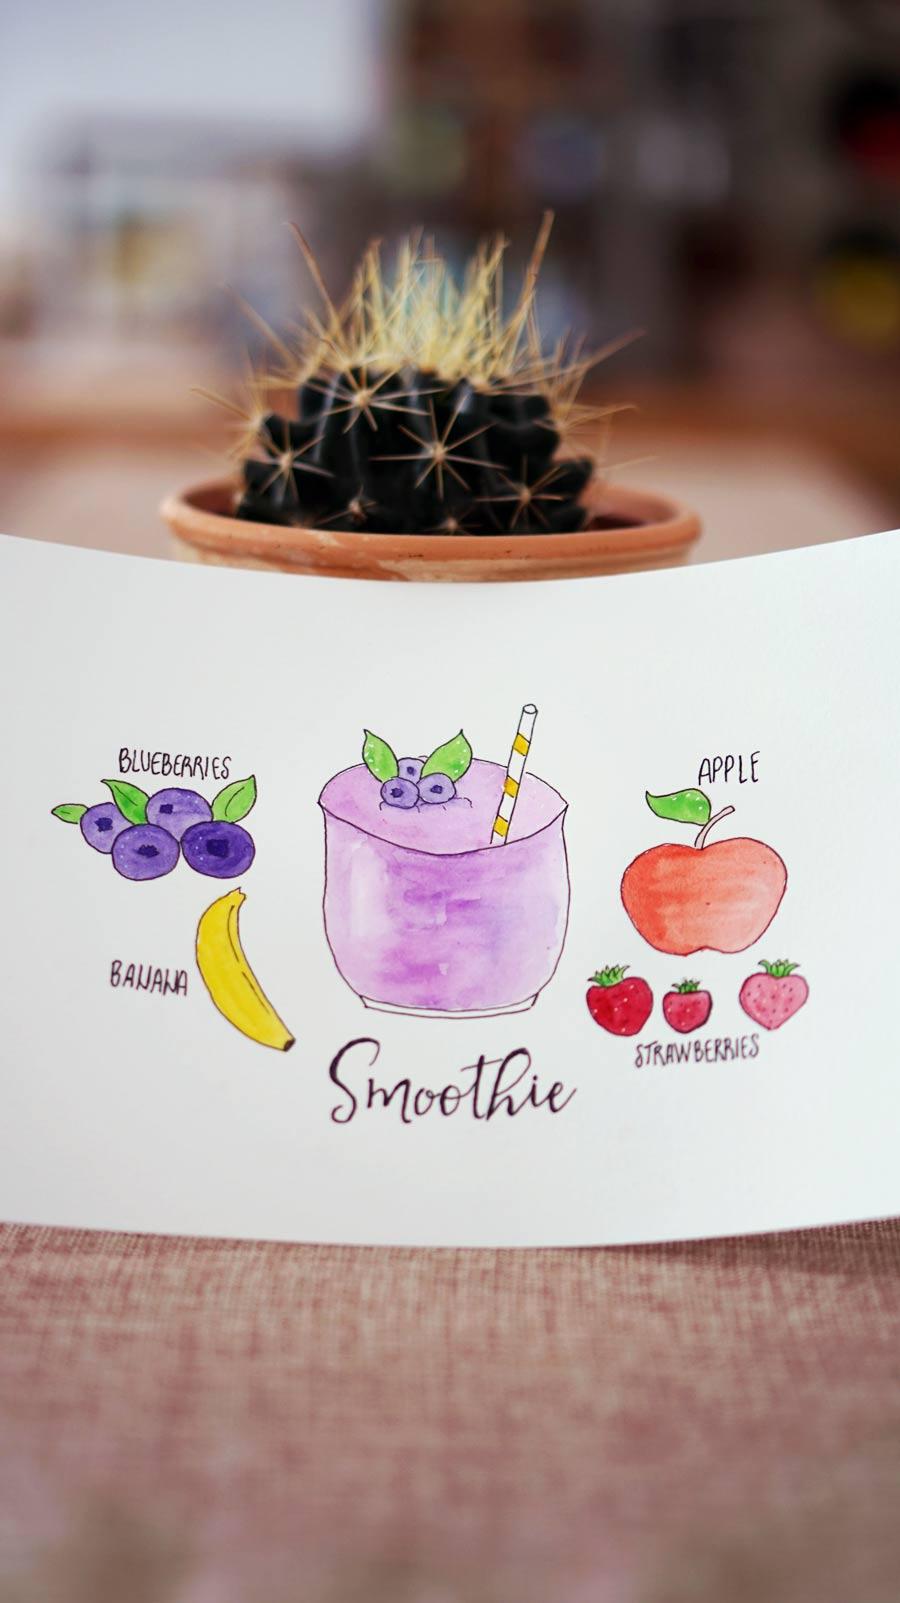 Smoothie Recipe Drawing